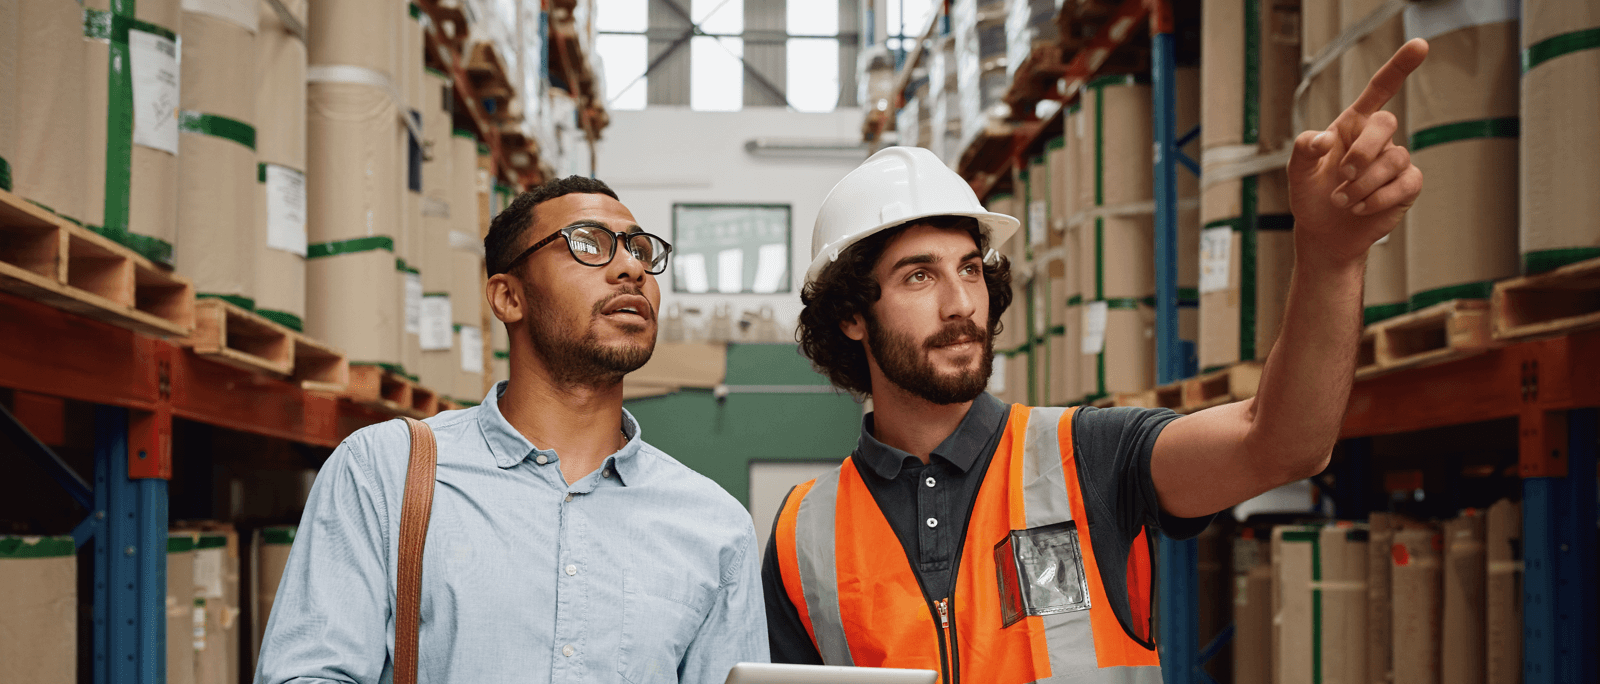 Warehouse Associate Job Description & Requirements